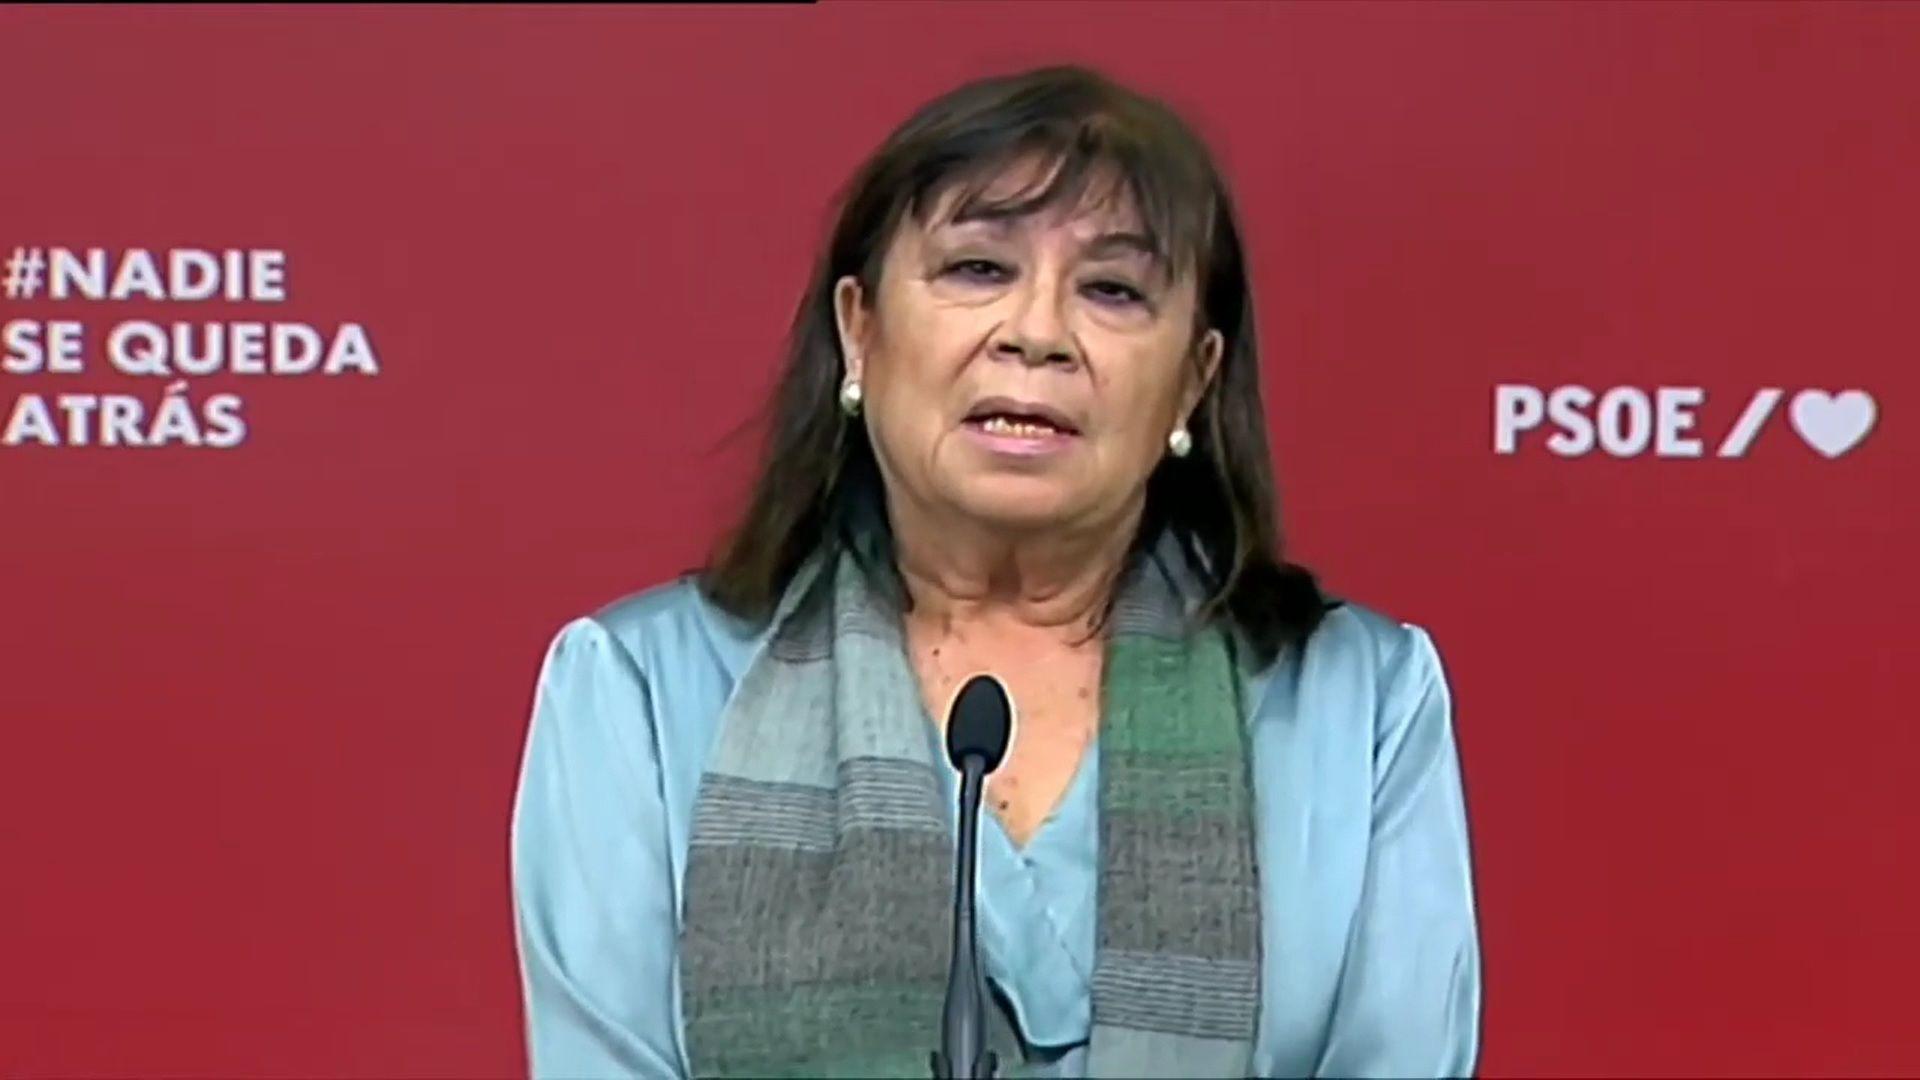 20/02/2021 Declaraciones de la presidenta del PSOE, Cristina Narbona POLITICA  CAPTURA YOUTUBE